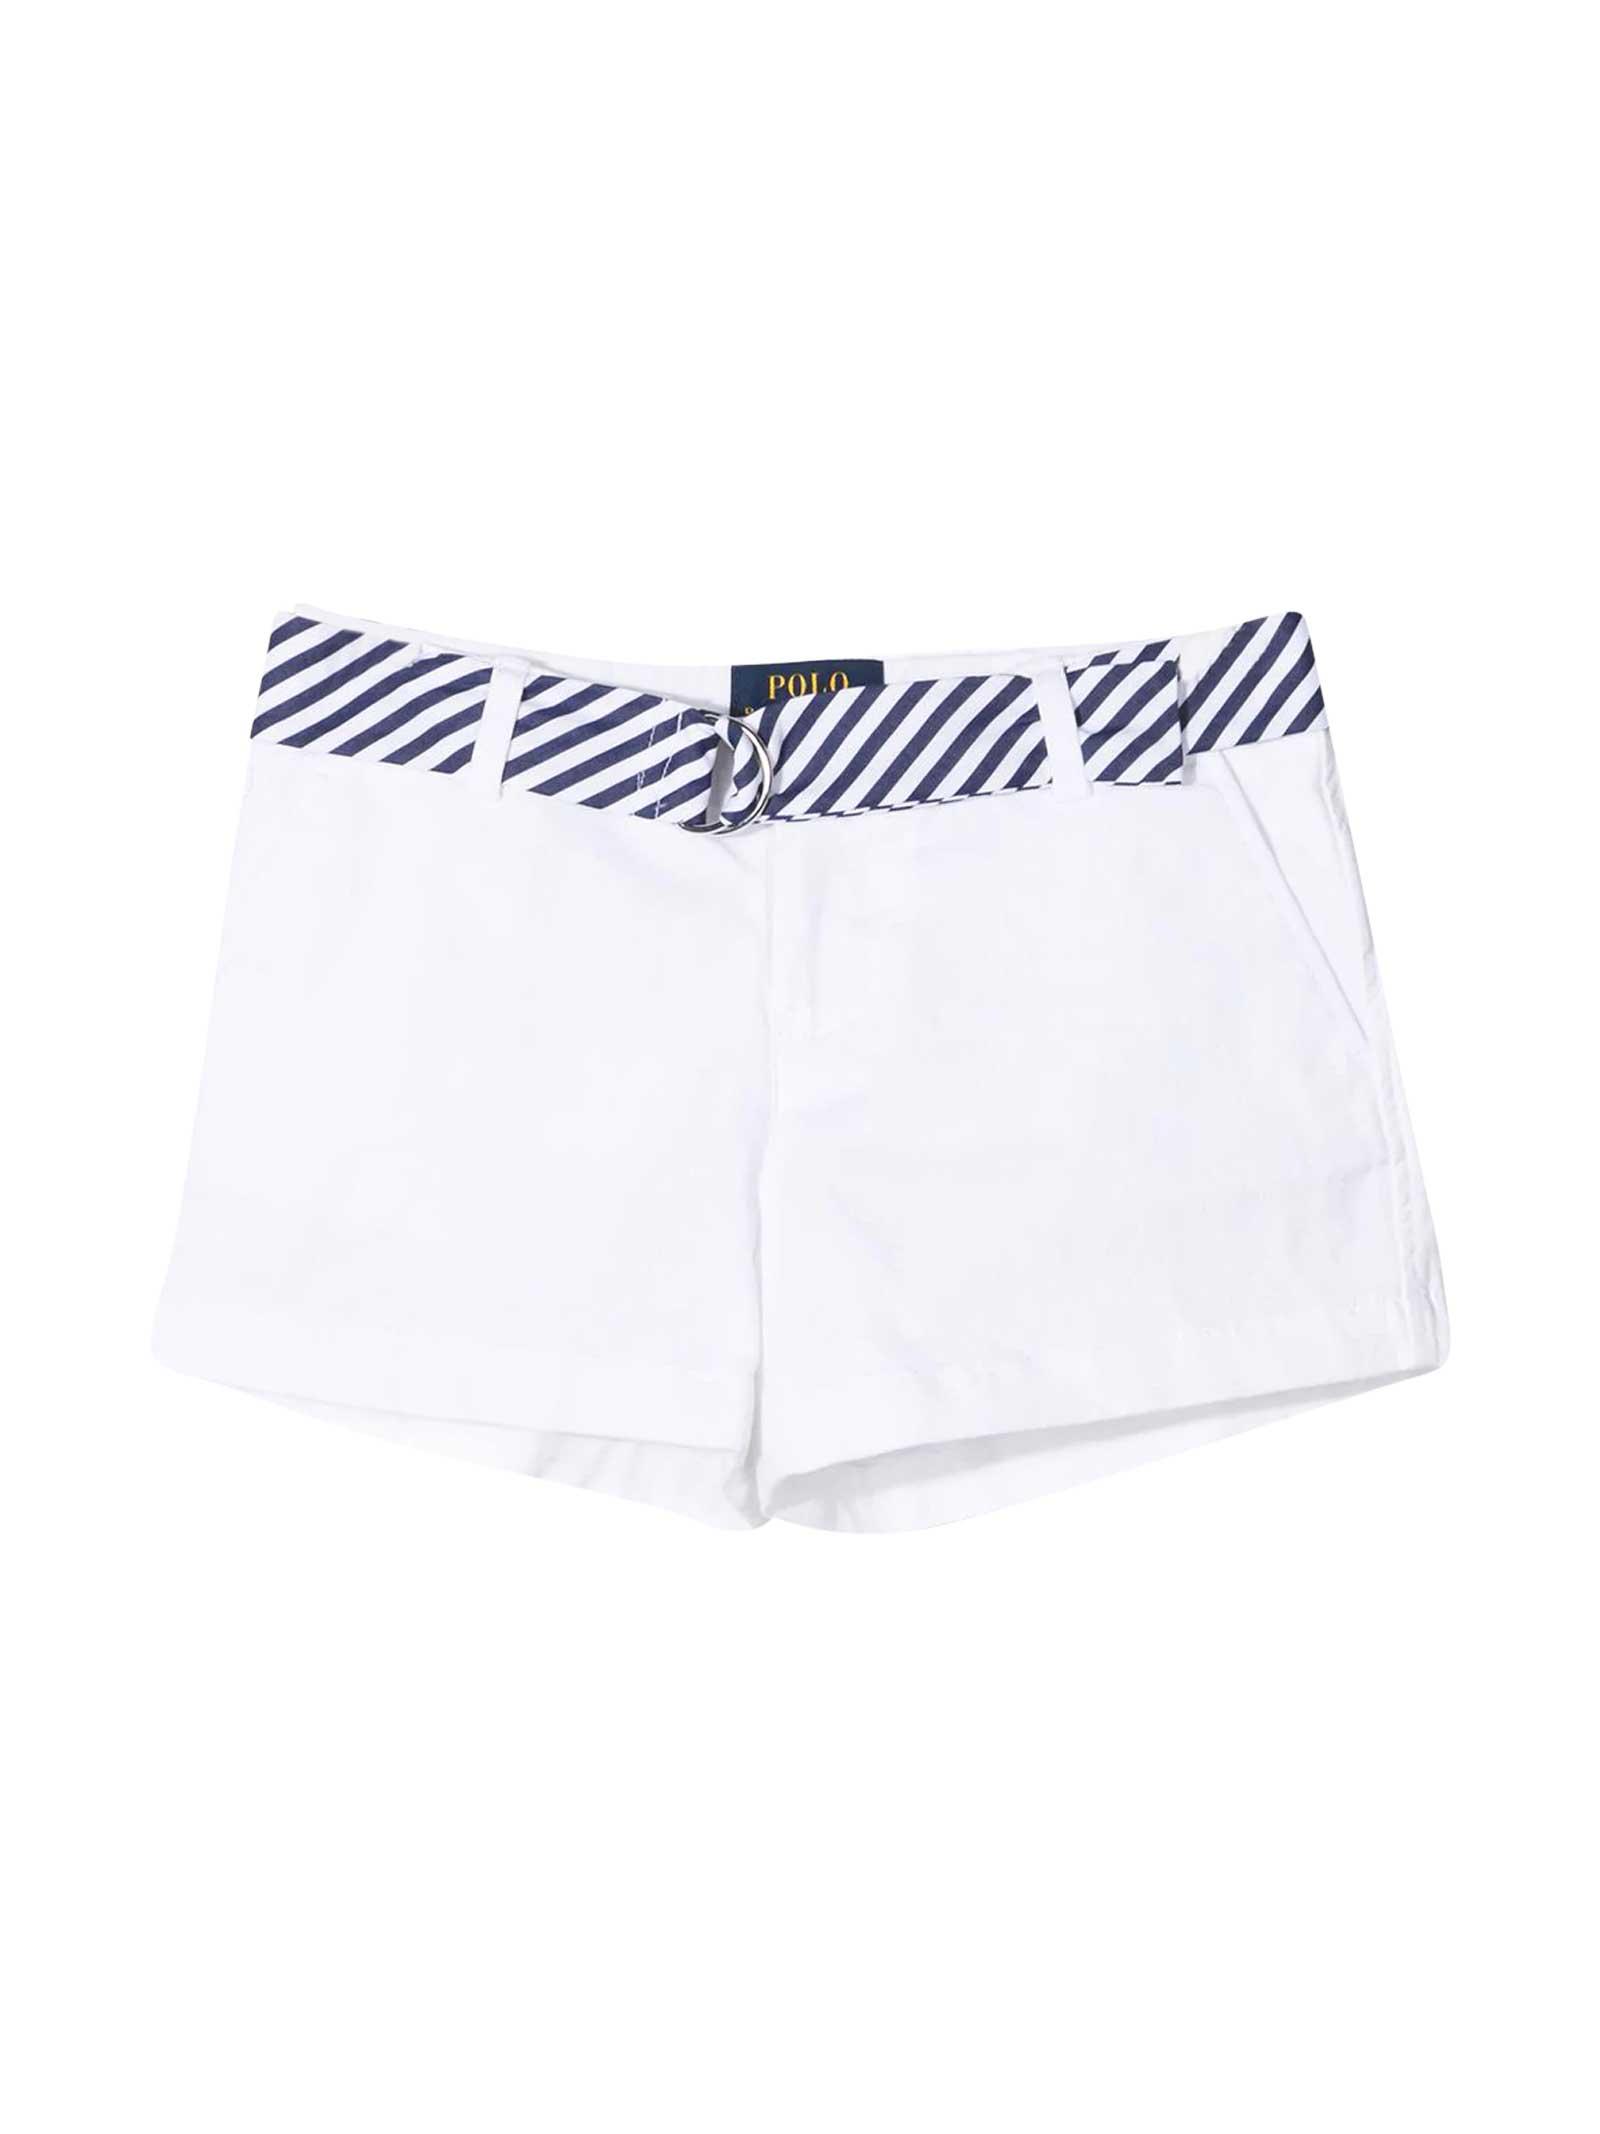 Ralph Lauren White Shorts